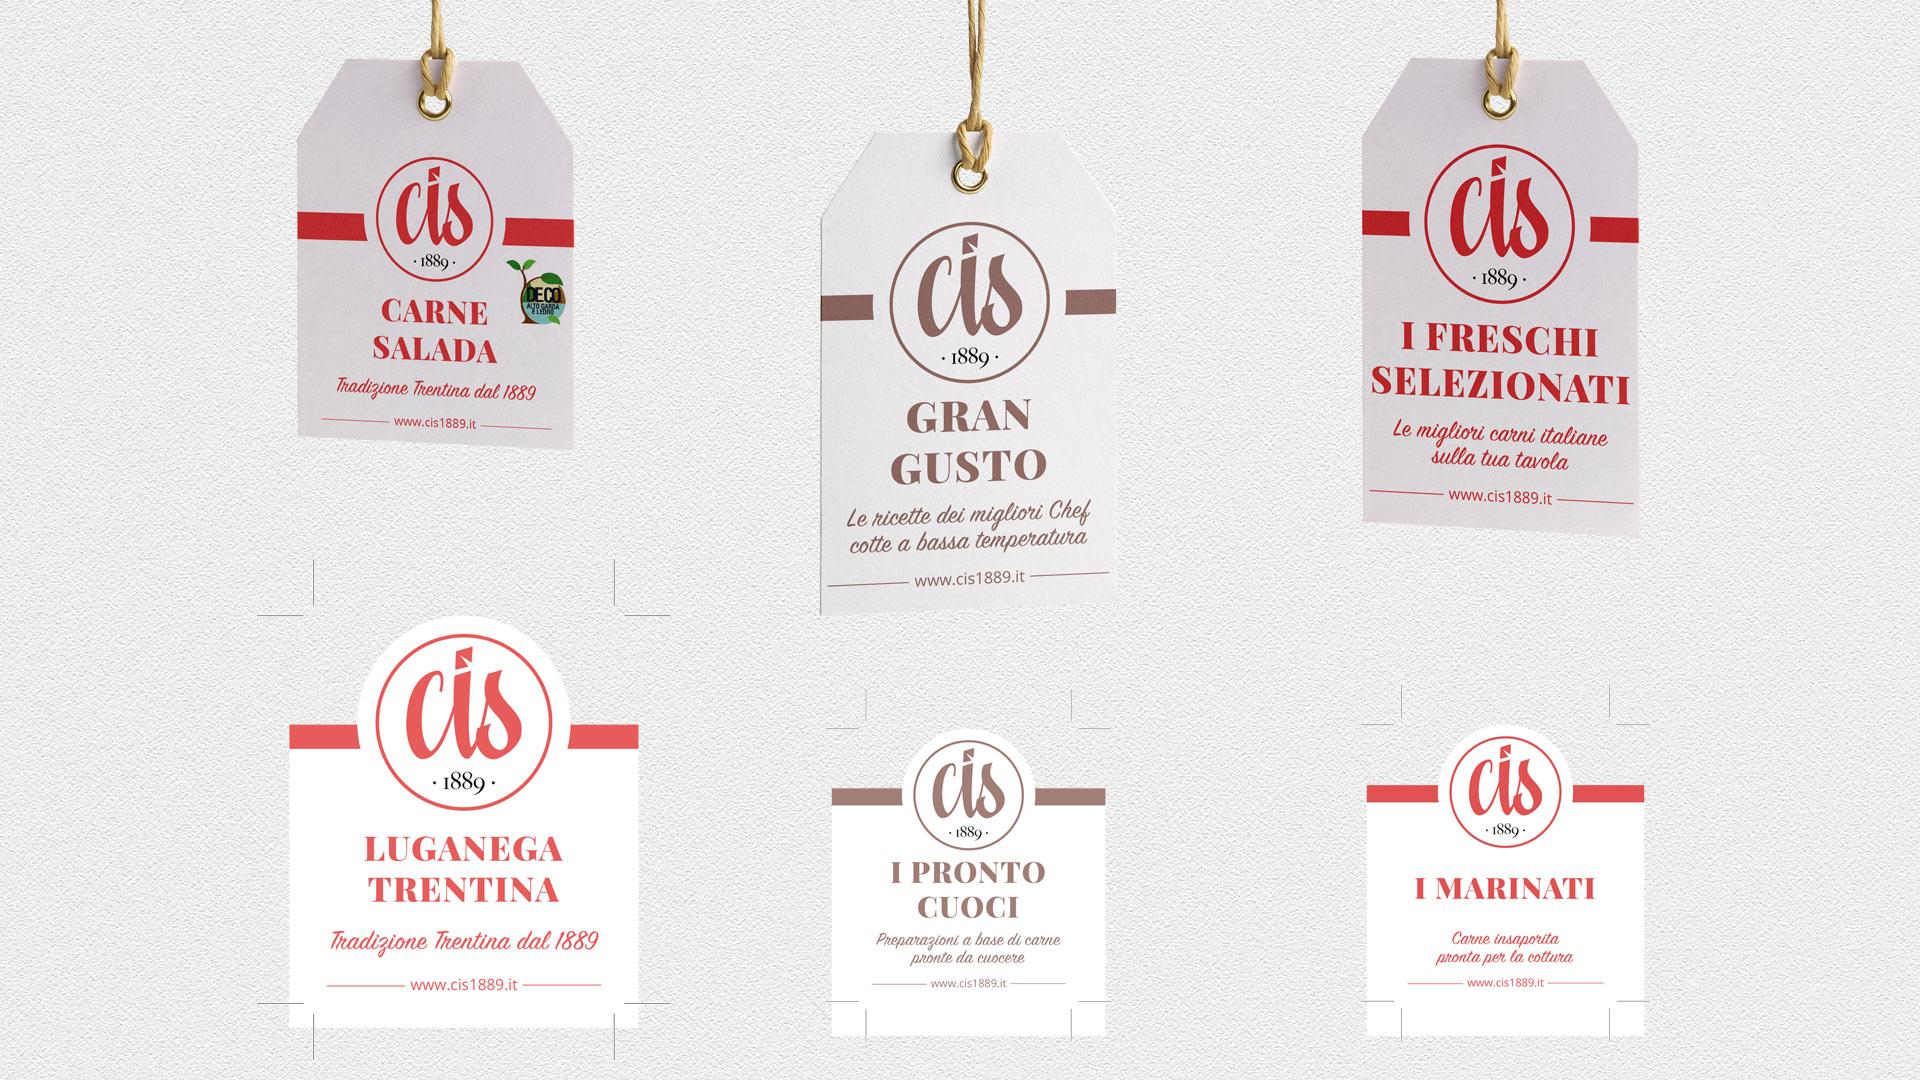 etichette label CIS packaging grafico milano